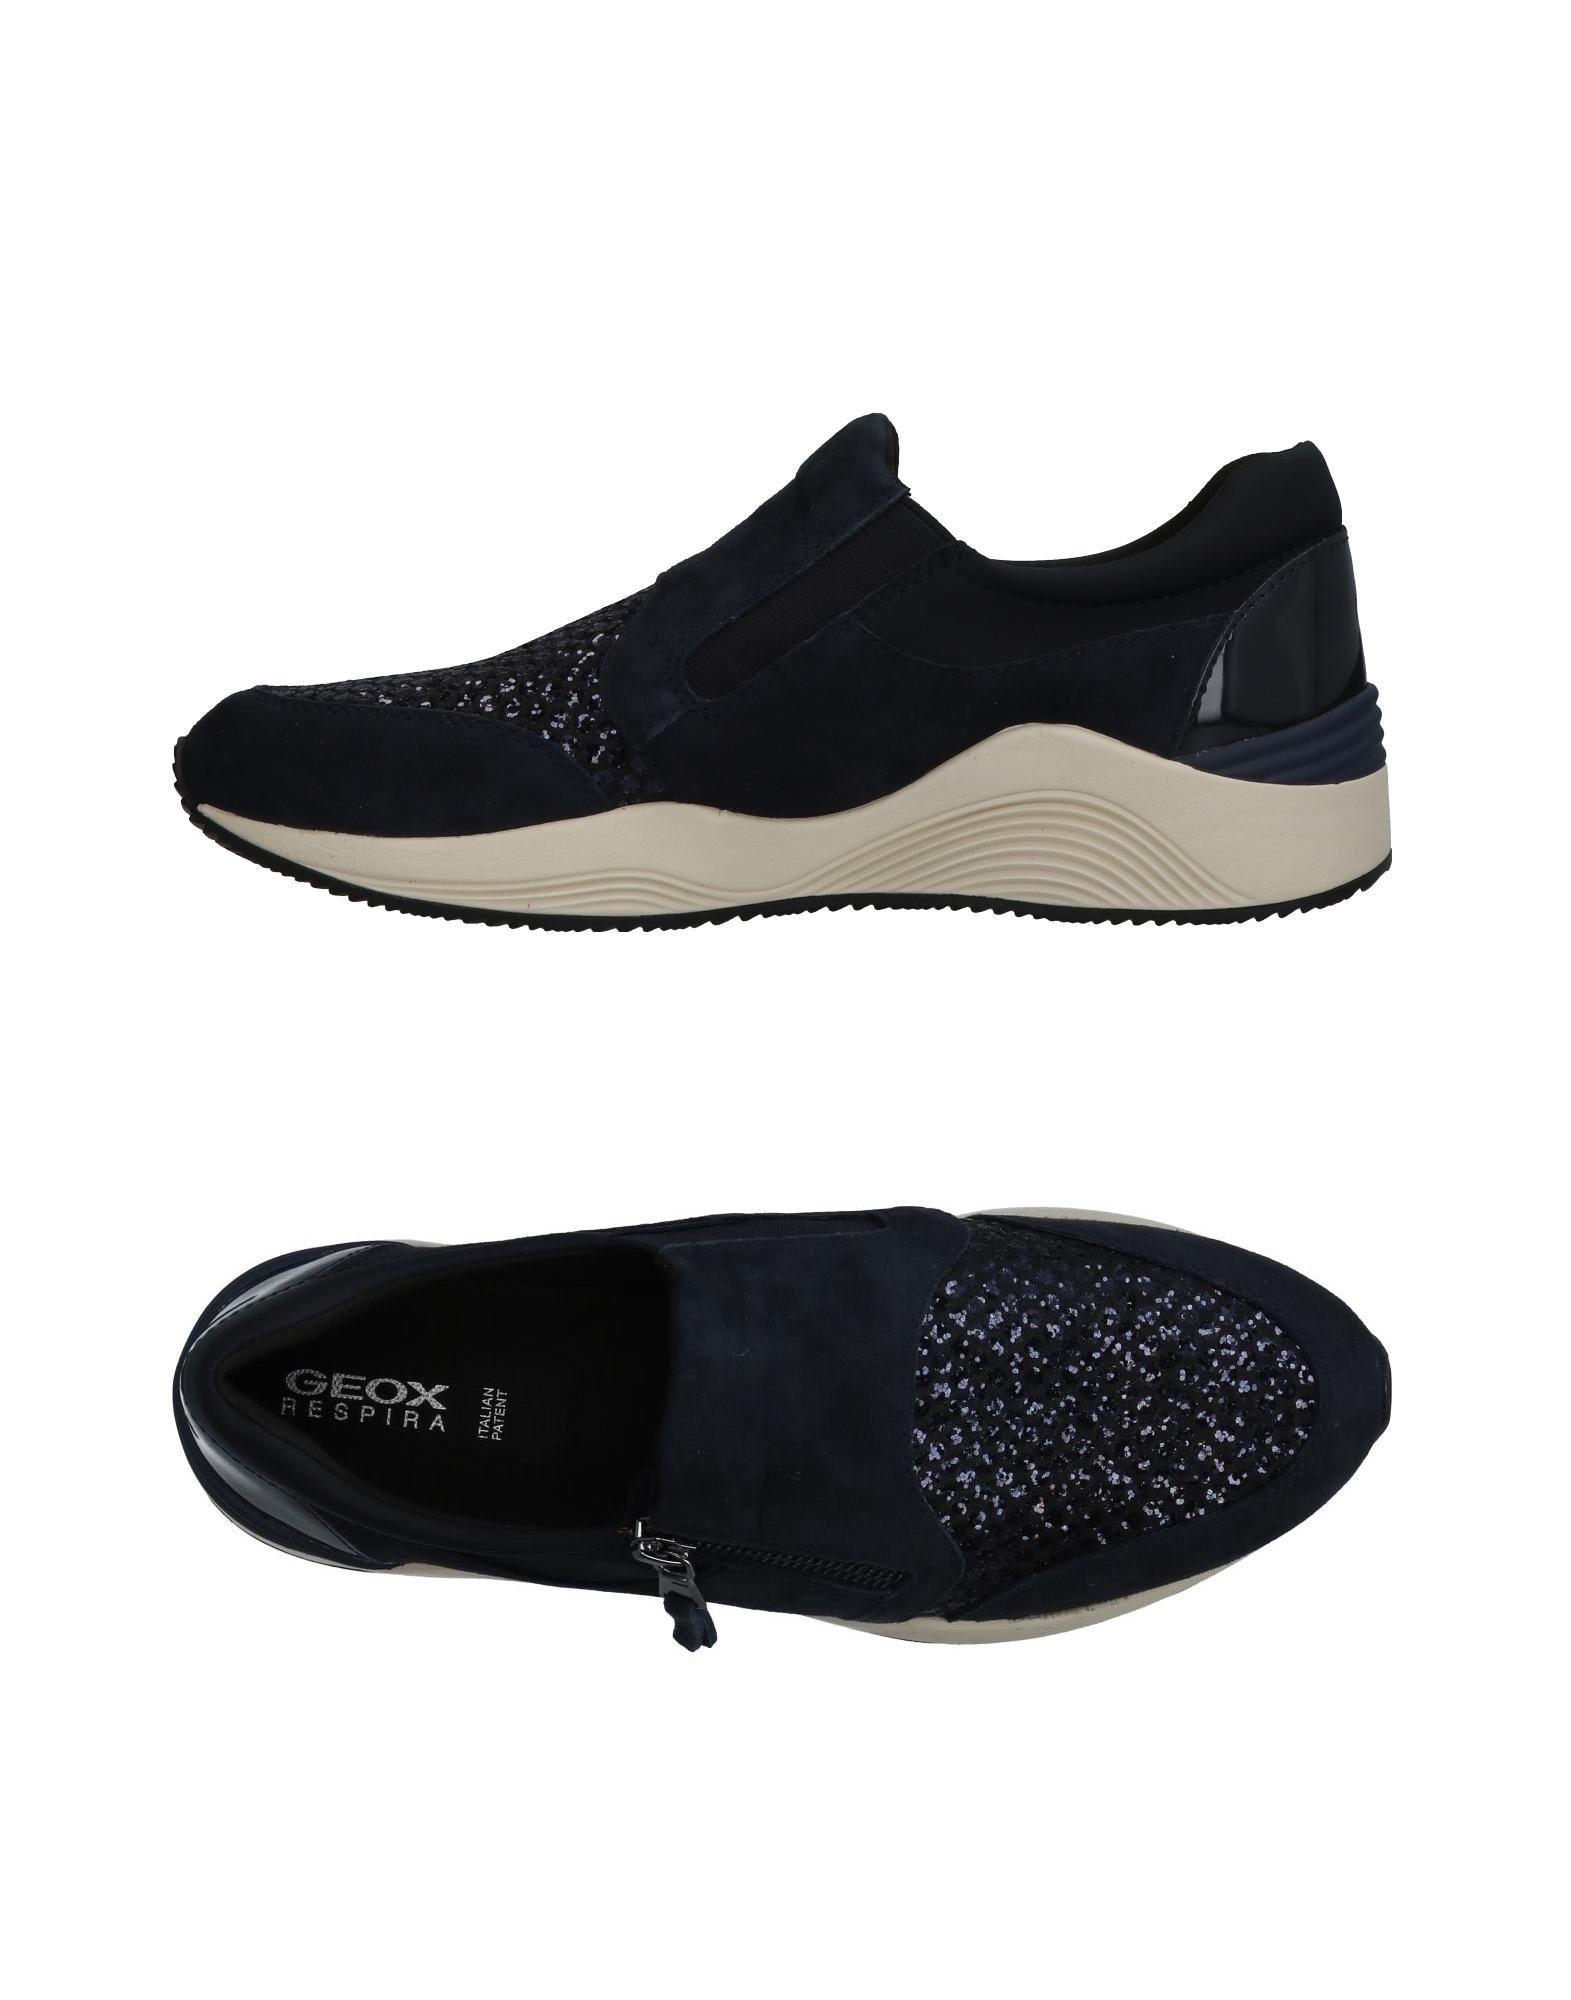 Zapatillas Geox Mujer - Zapatillas Zapatillas Zapatillas Geox  Negro 6aeaab